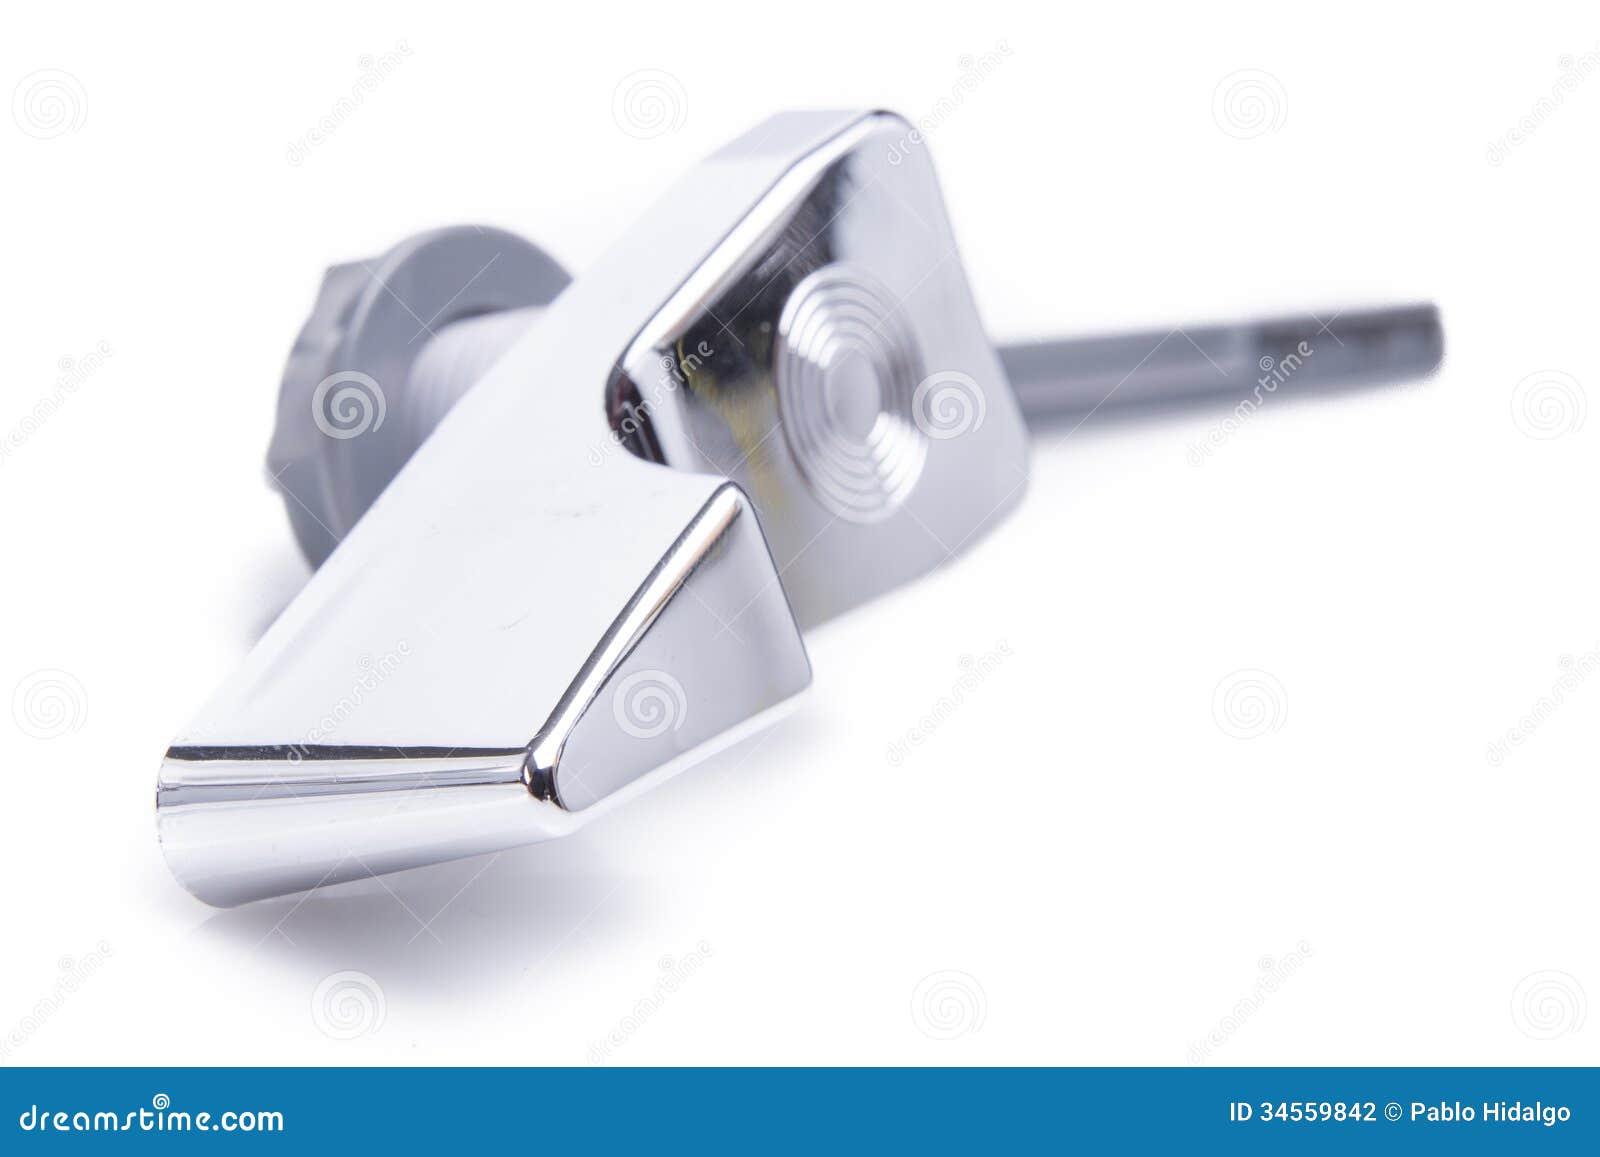 how to fix my toilet handle